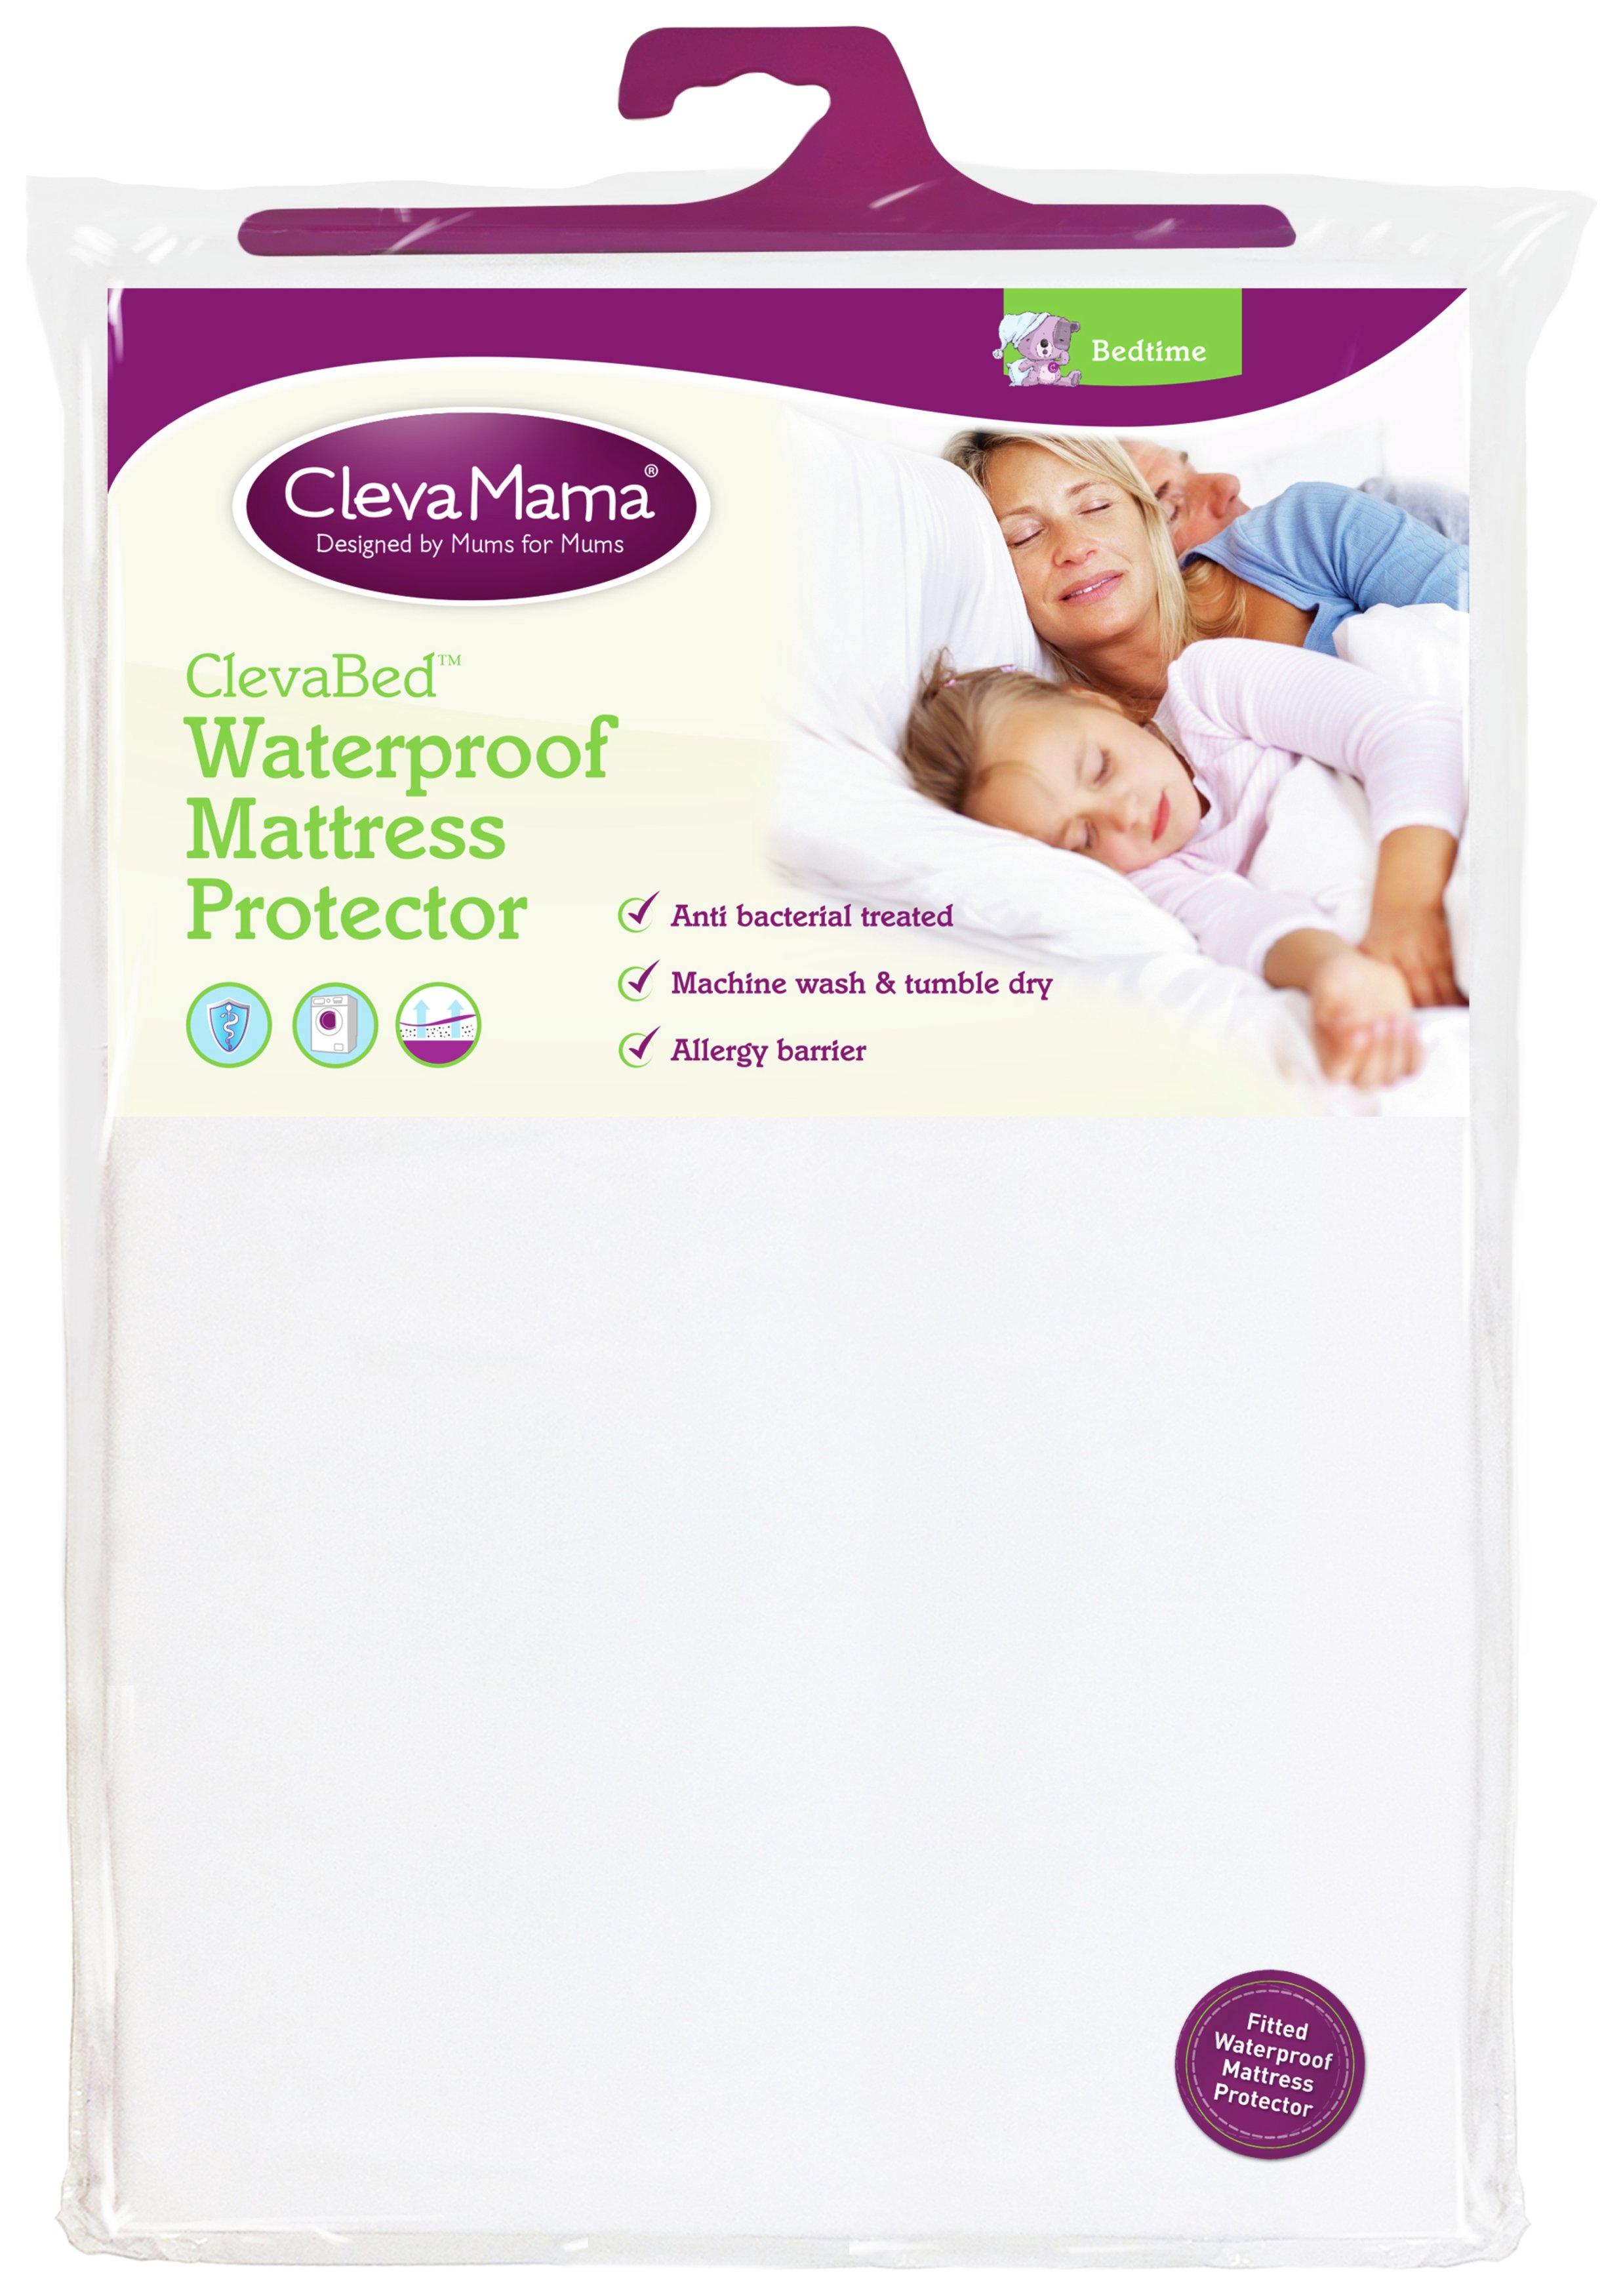 Clevamama Cotton Waterproof Mattress Protector